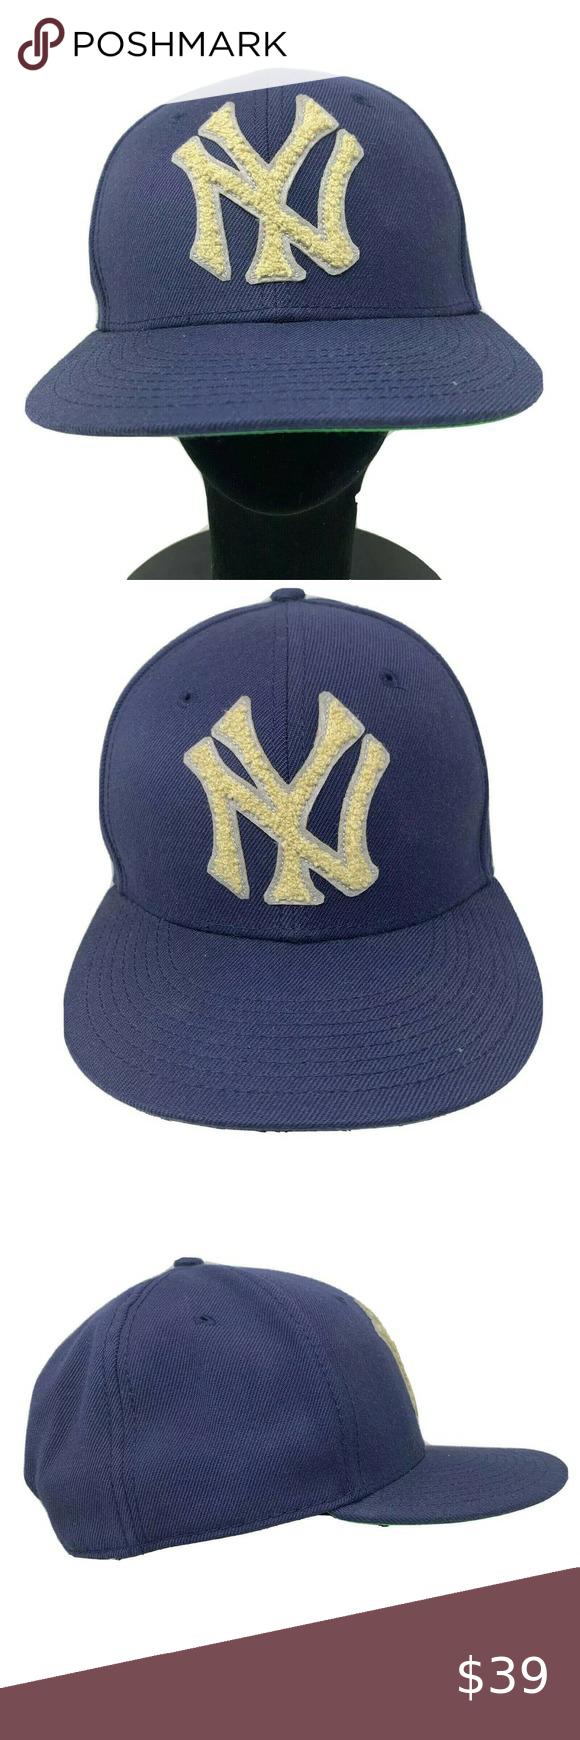 New York Ny Yankees American Needle Snapback Cap Ny Yankees Fitted Hats Columbus Blue Jackets